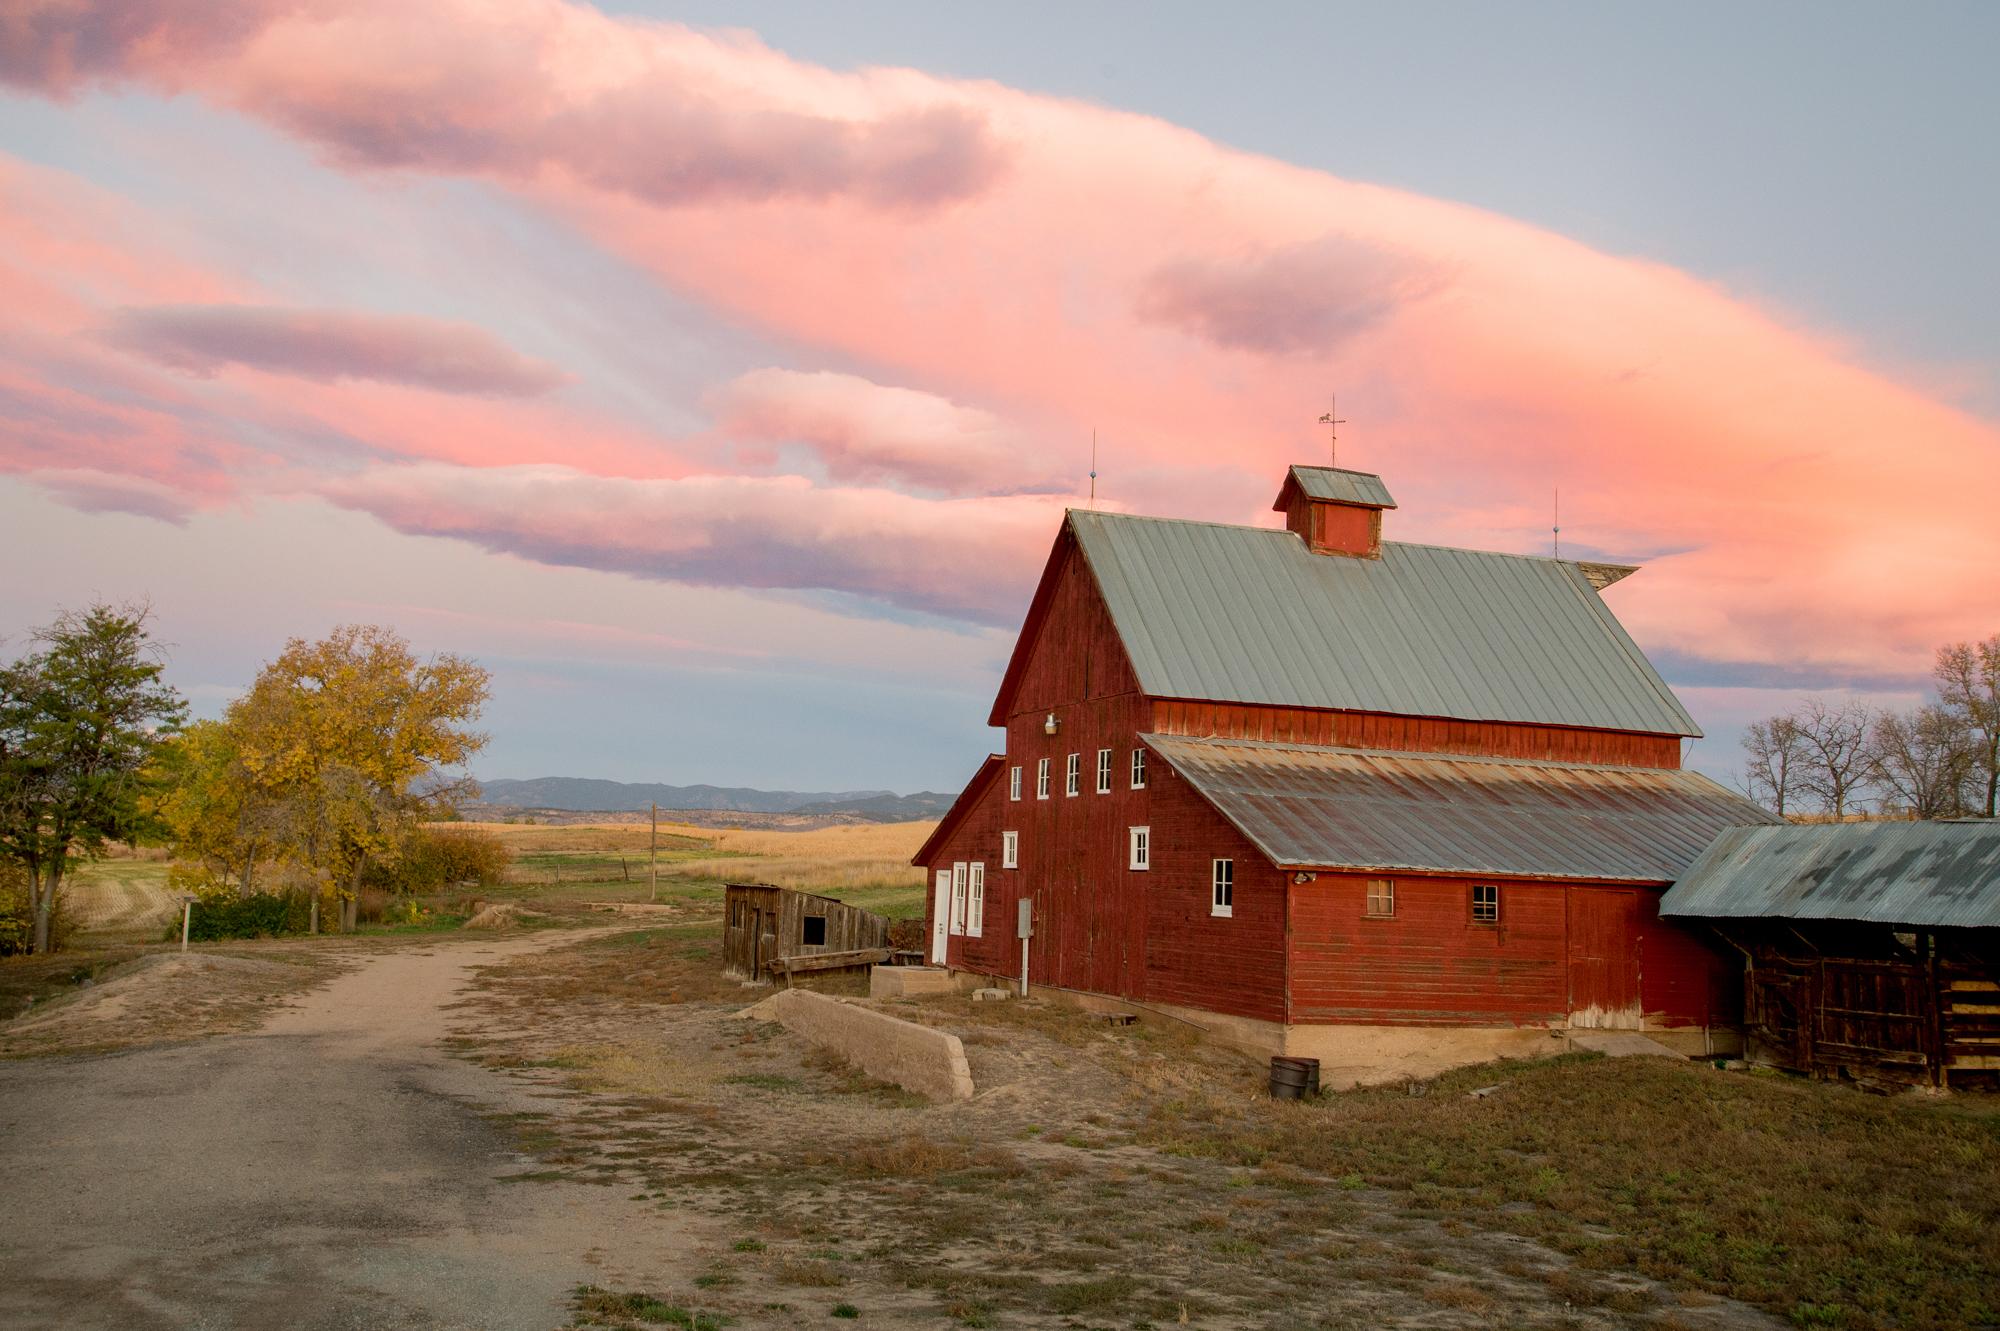 Image 3: Little Thompson Farm